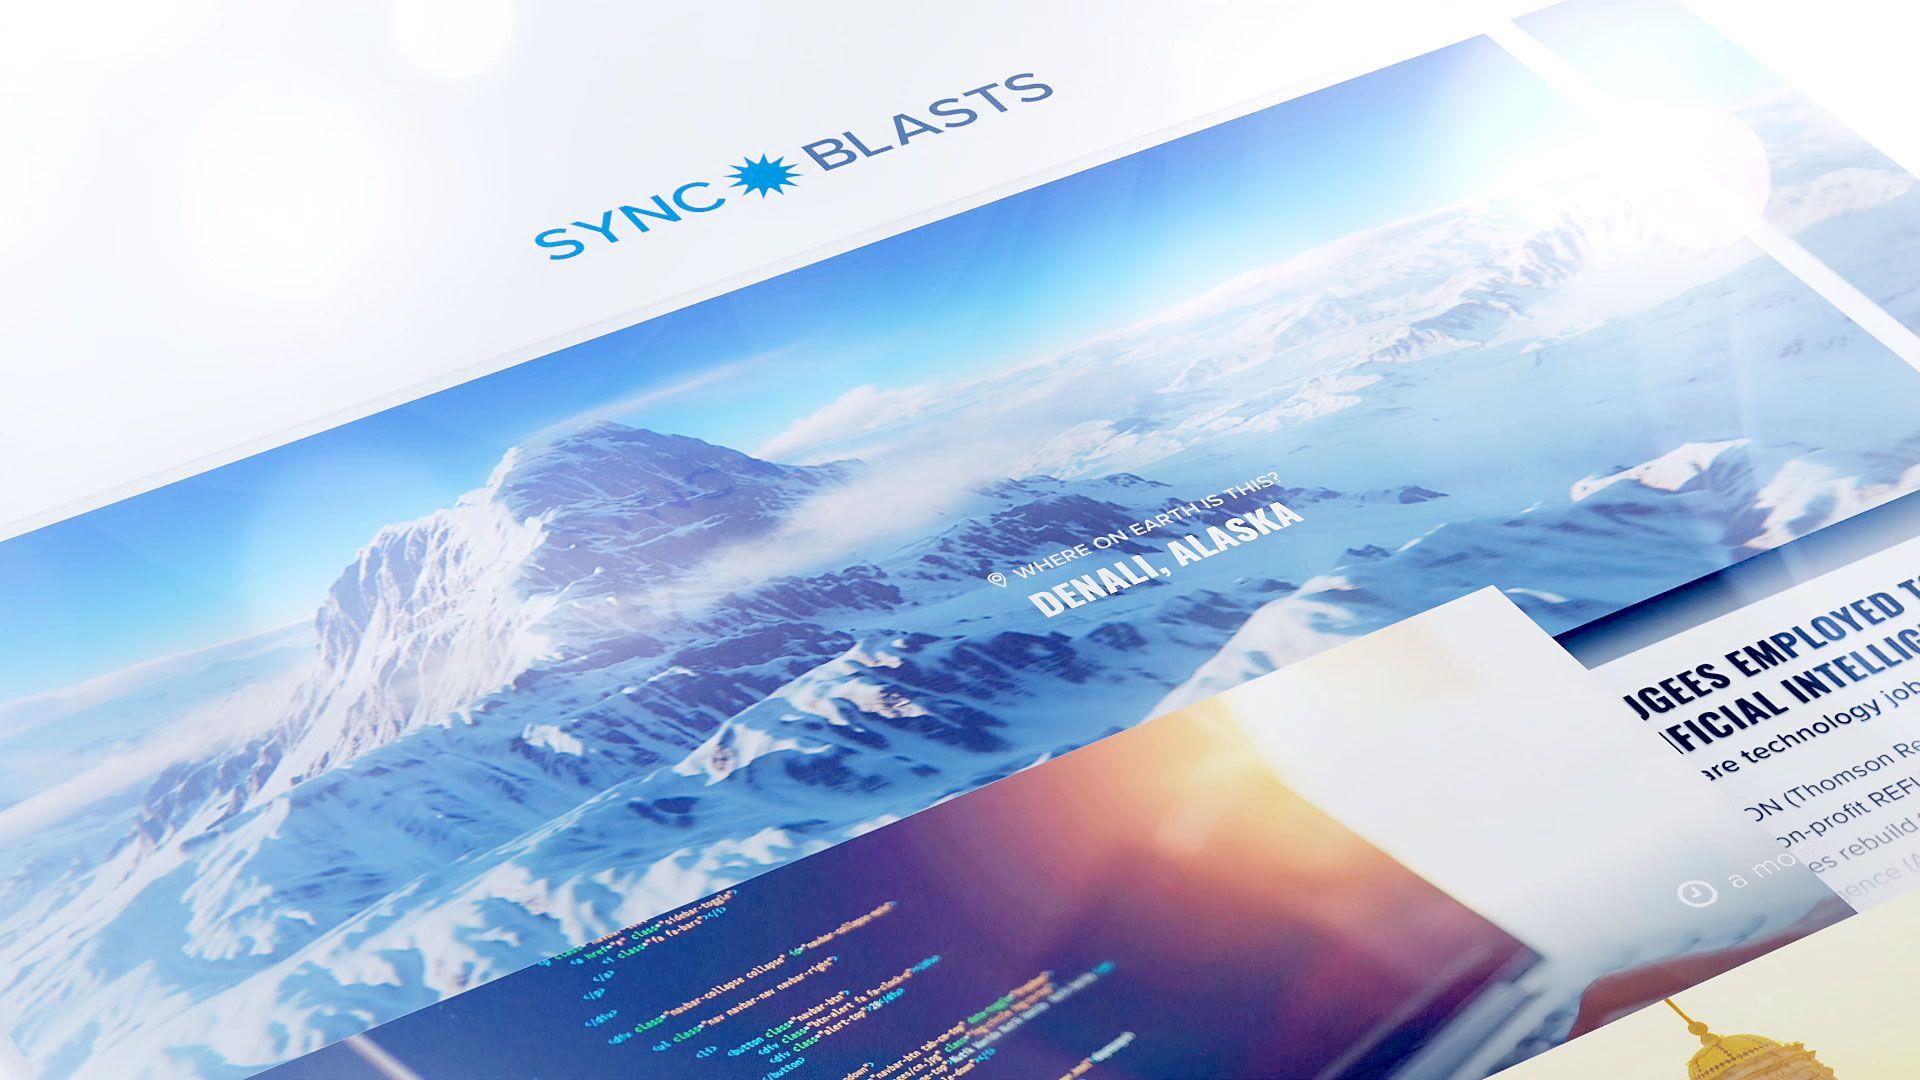 Syncblasts